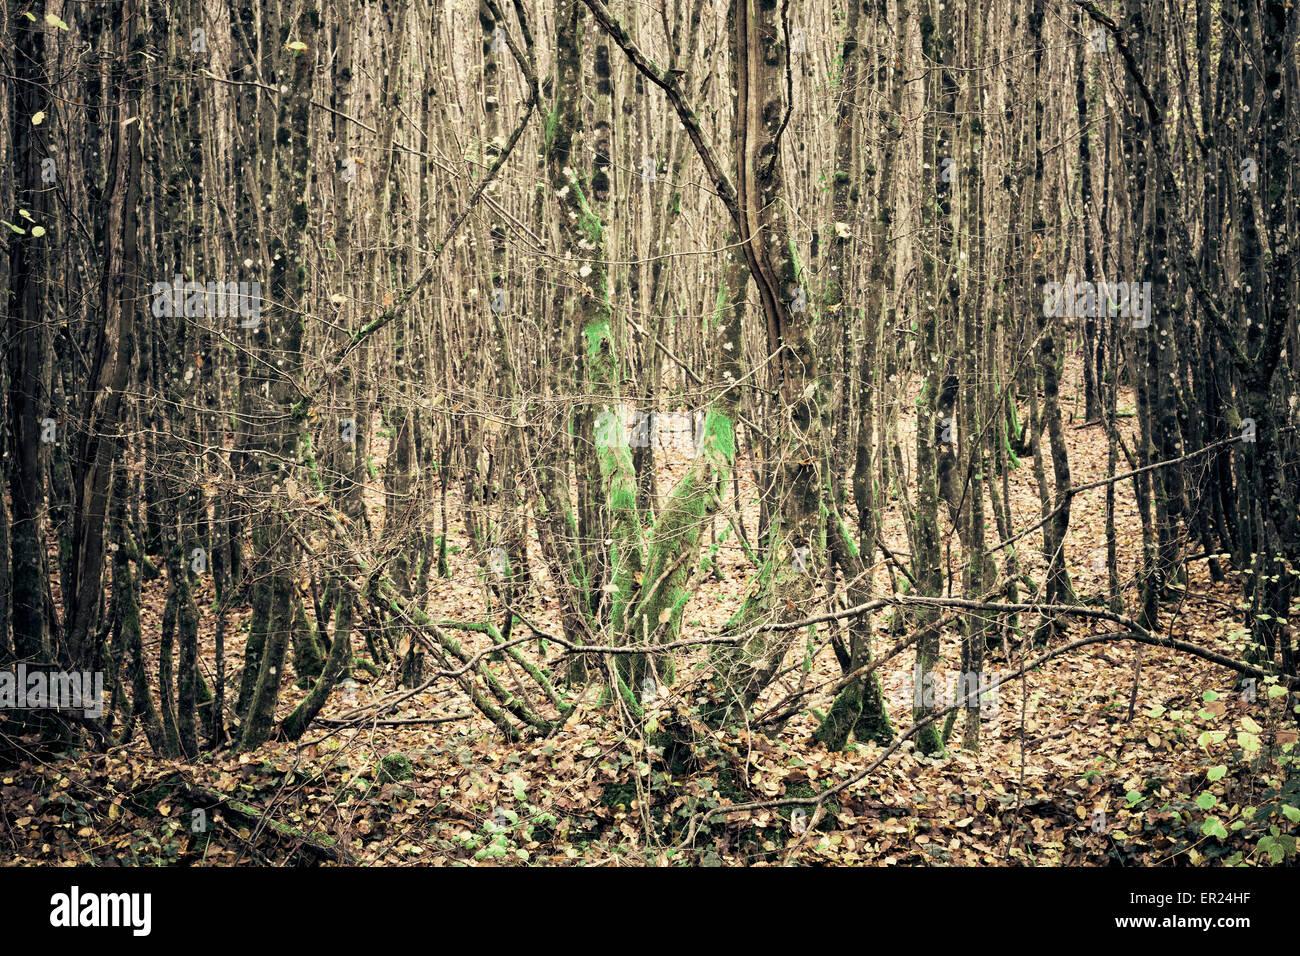 Árbol de madera de árboles de bosque Imagen De Stock